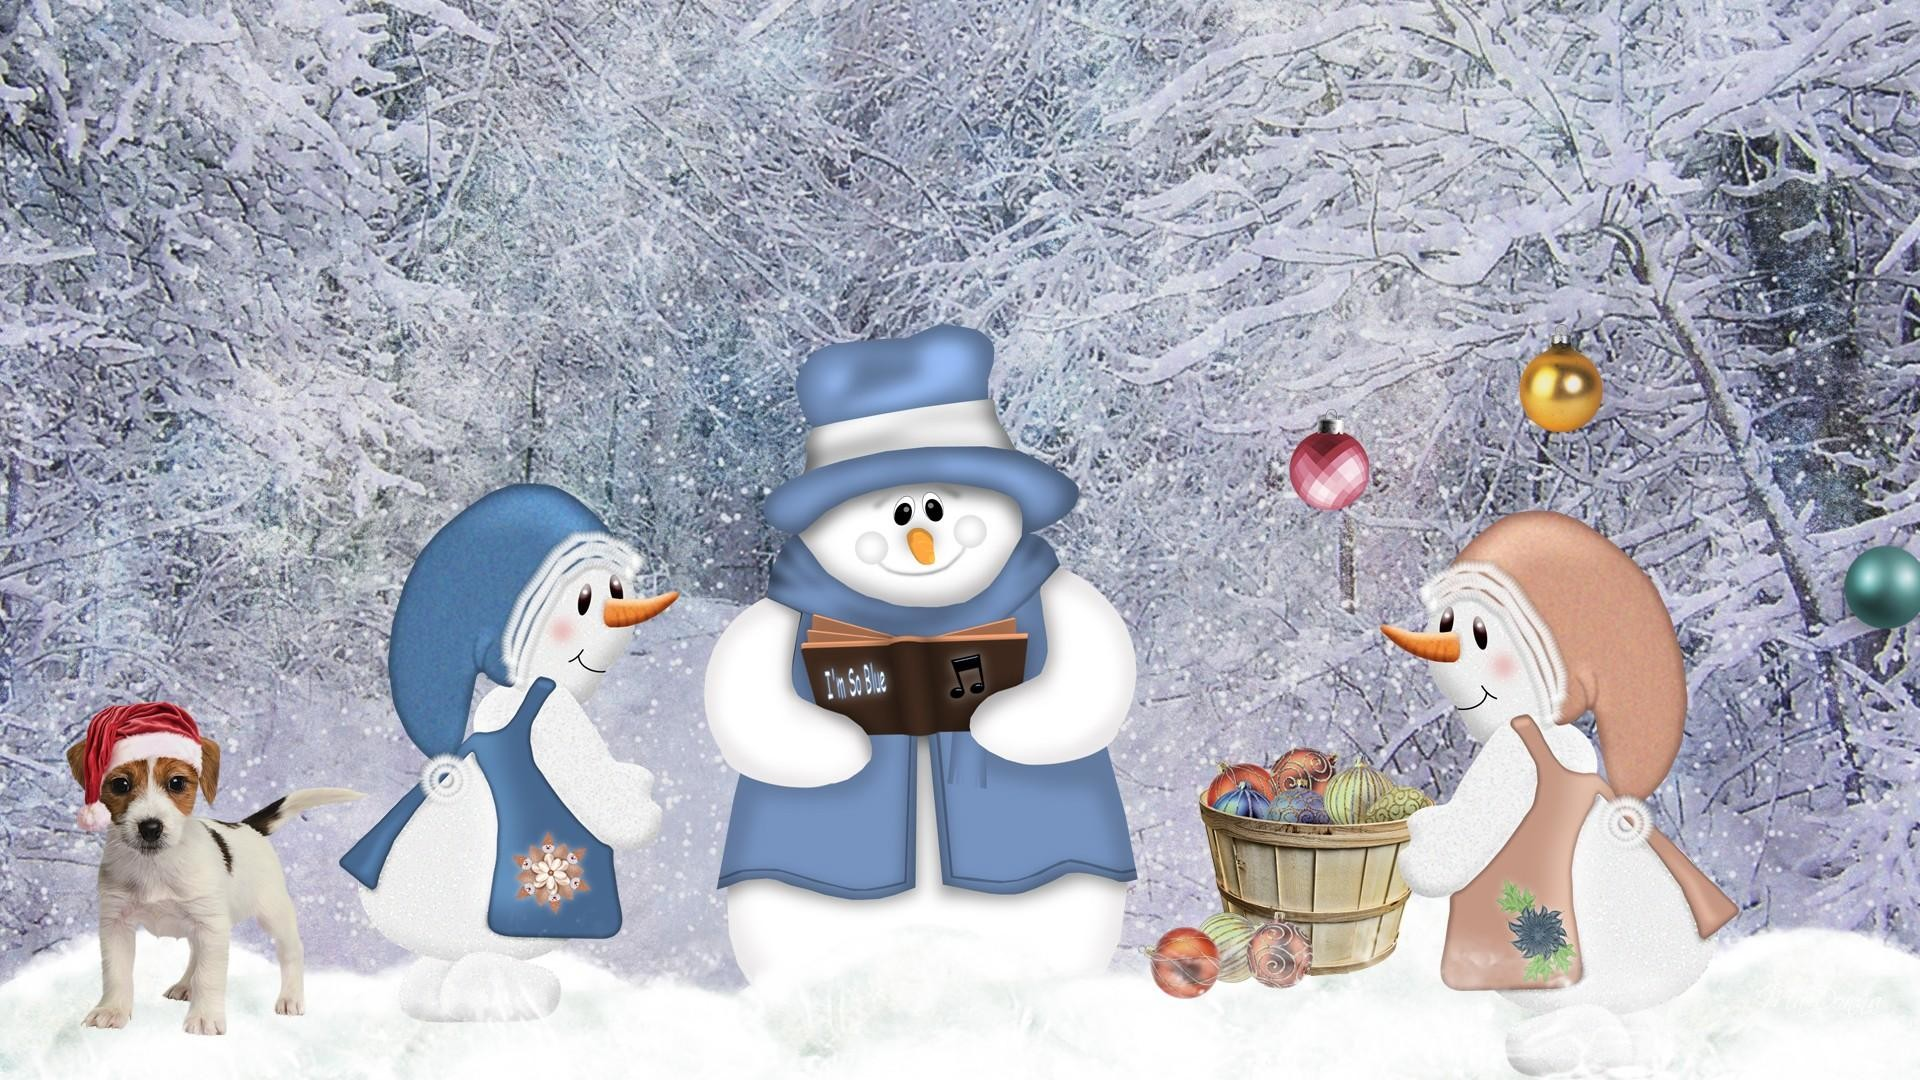 1920x1080 FunMozar Christmas Snow Wallpapers